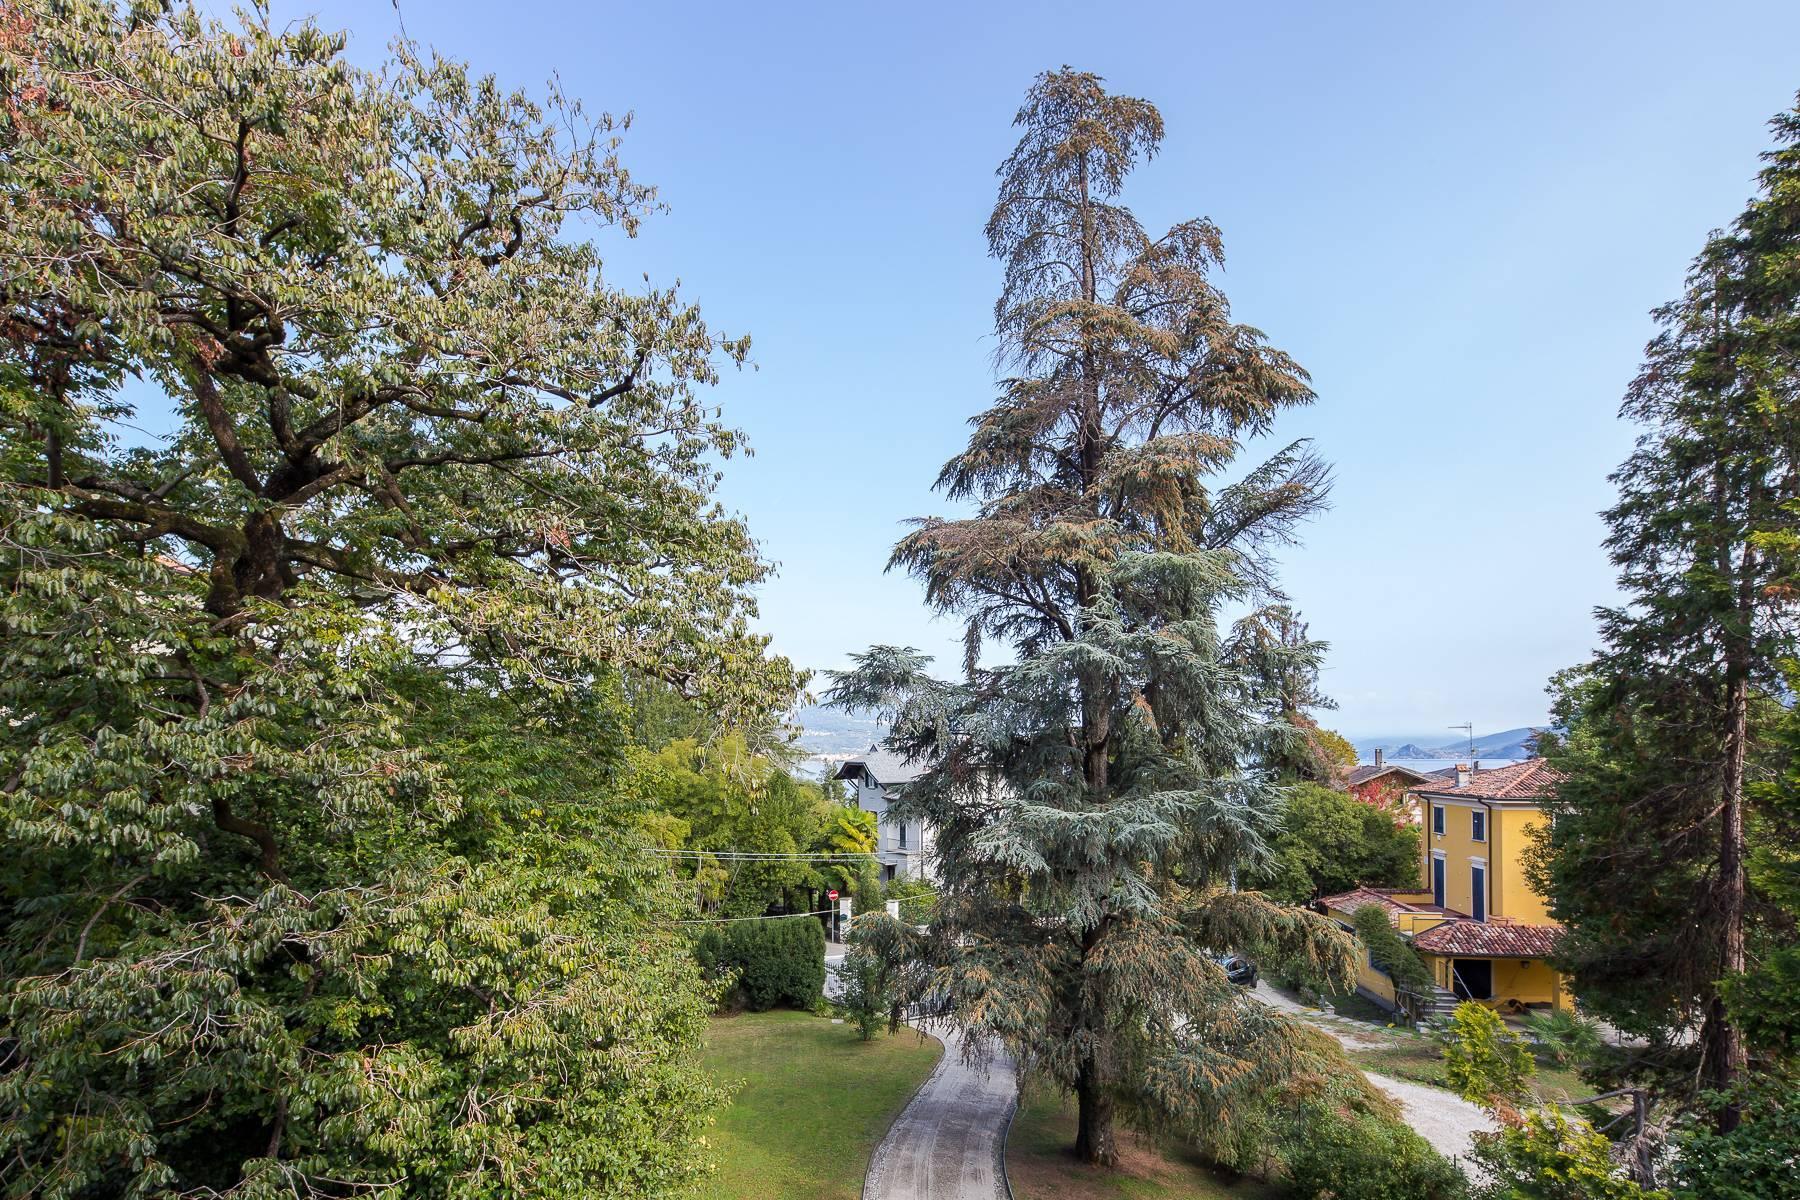 Stresa的历史中心的别墅 - 28